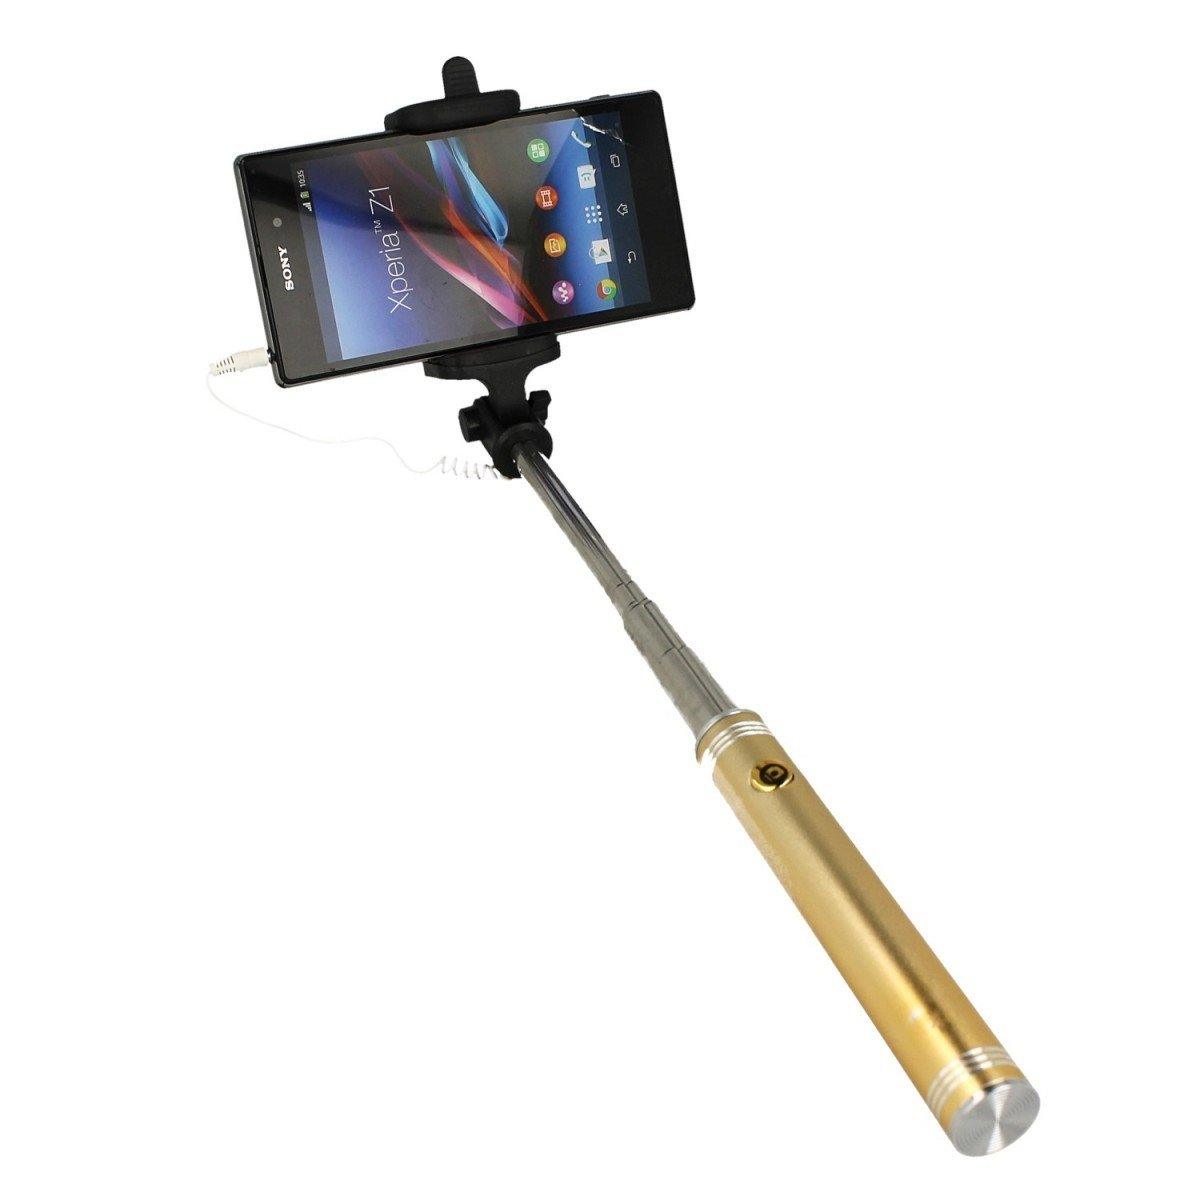 uchwyt selfie stick z pilotem w r czce do telefonu z oty marketgsm sklep krak w. Black Bedroom Furniture Sets. Home Design Ideas